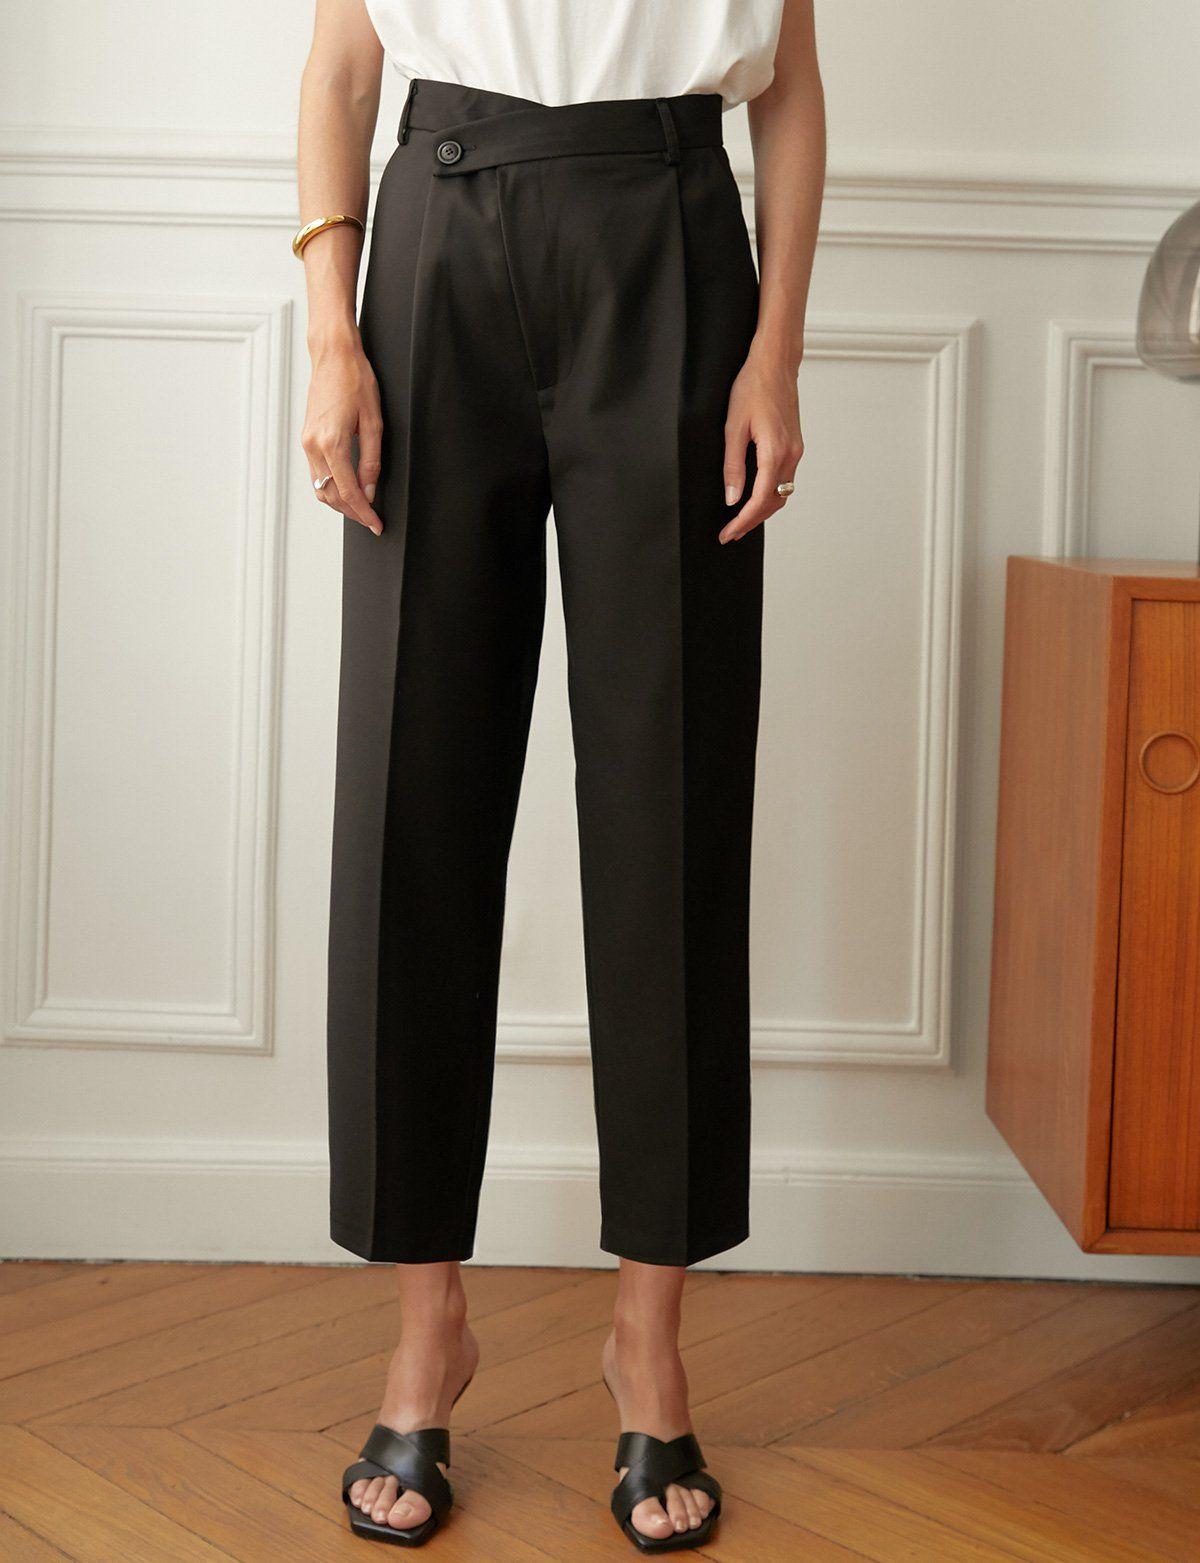 Black Crossover Pant Black Dress Pants Outfits Black Cullotes Outfits Pixie Pants Outfit [ 1563 x 1200 Pixel ]